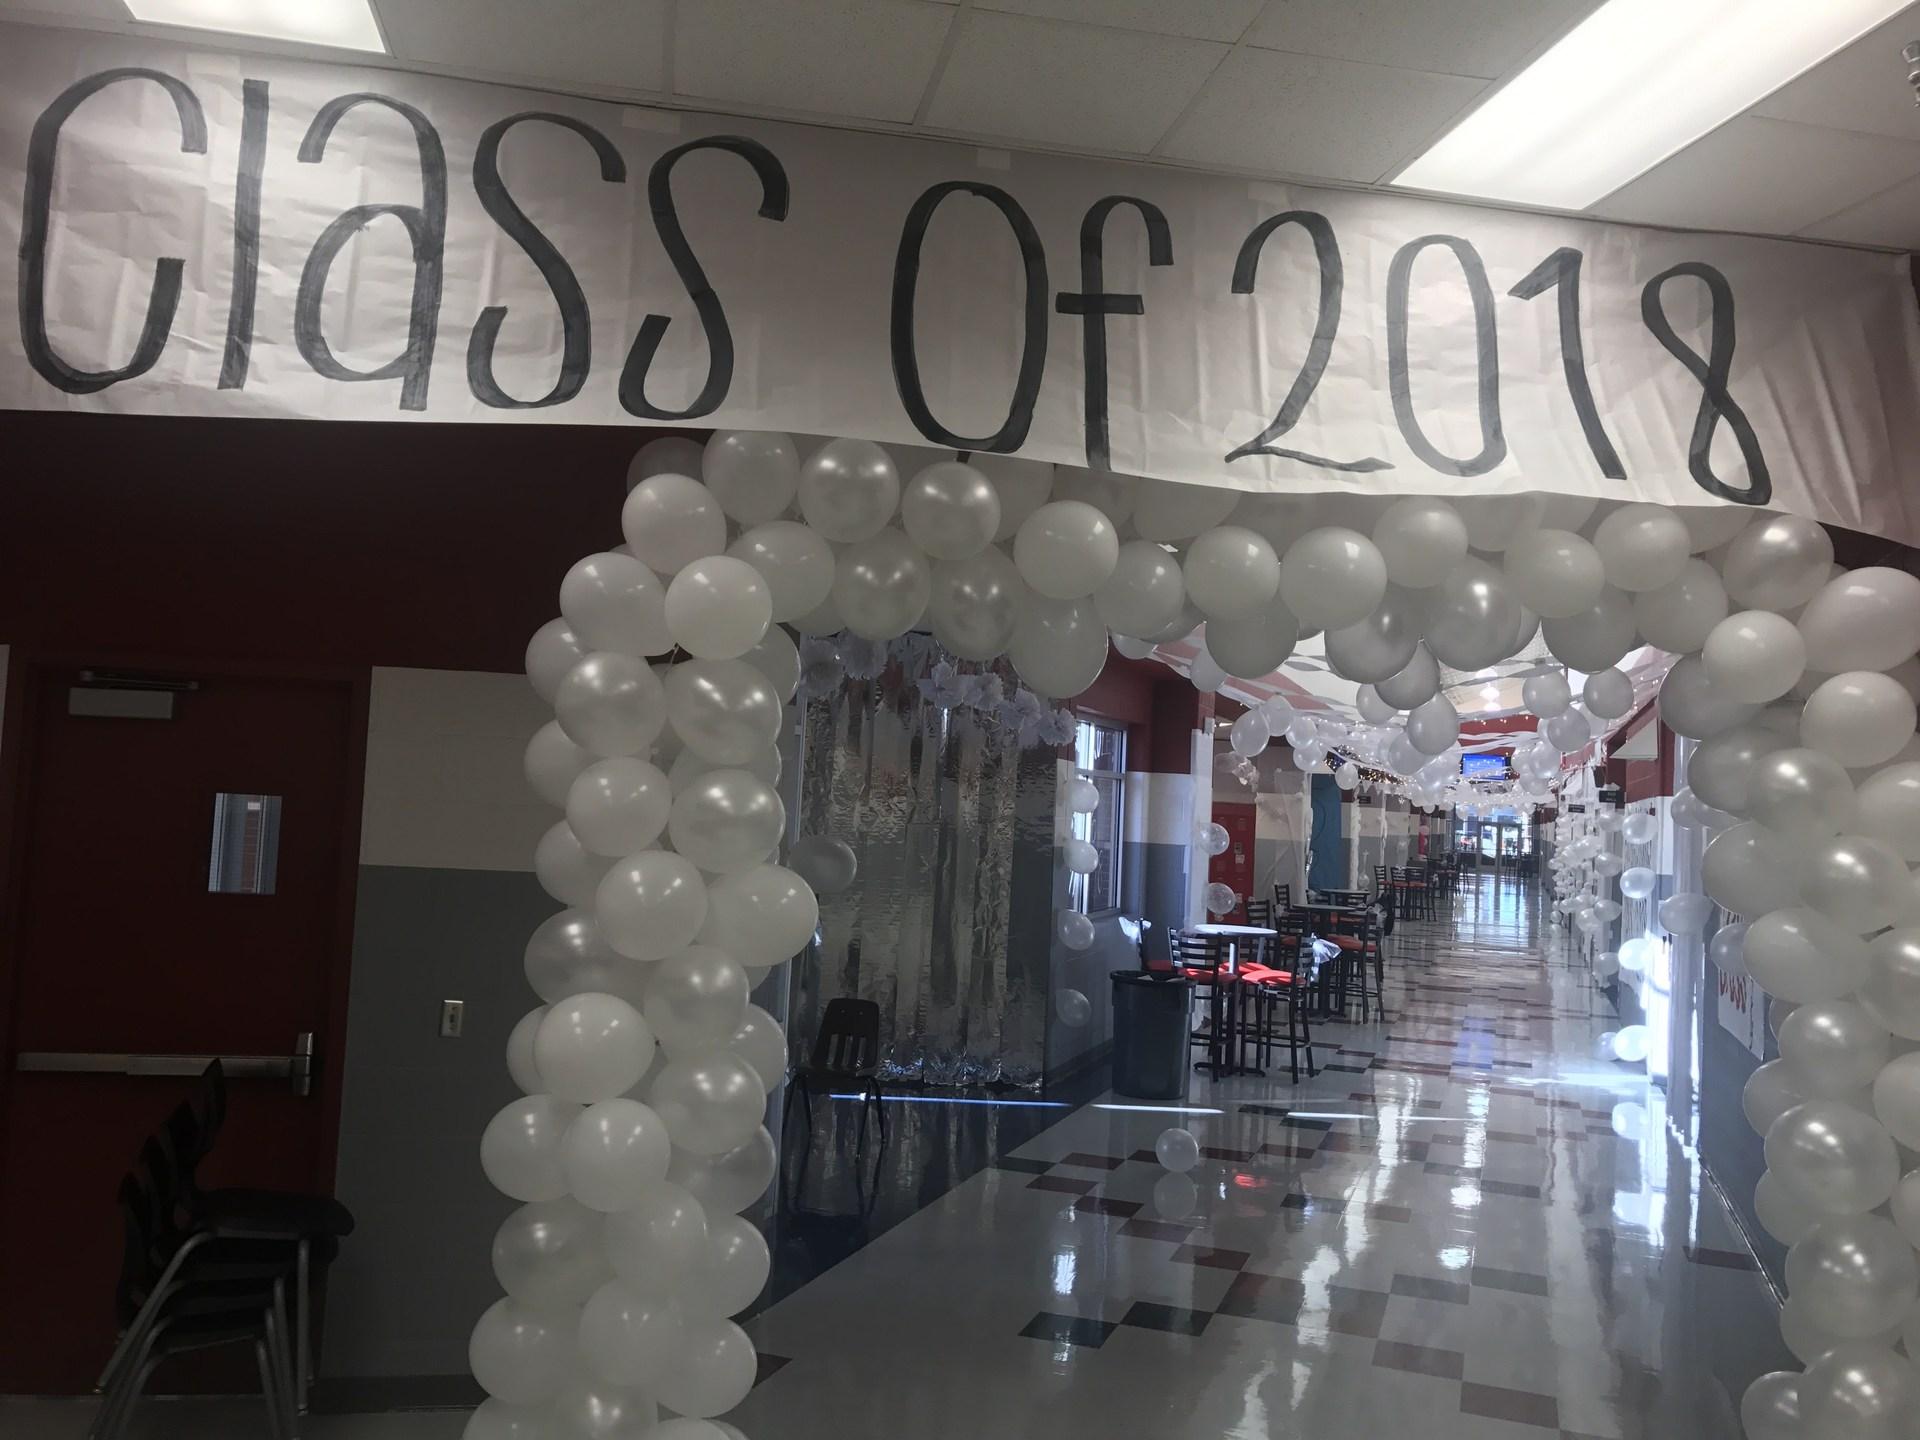 Class of 2018 Hall